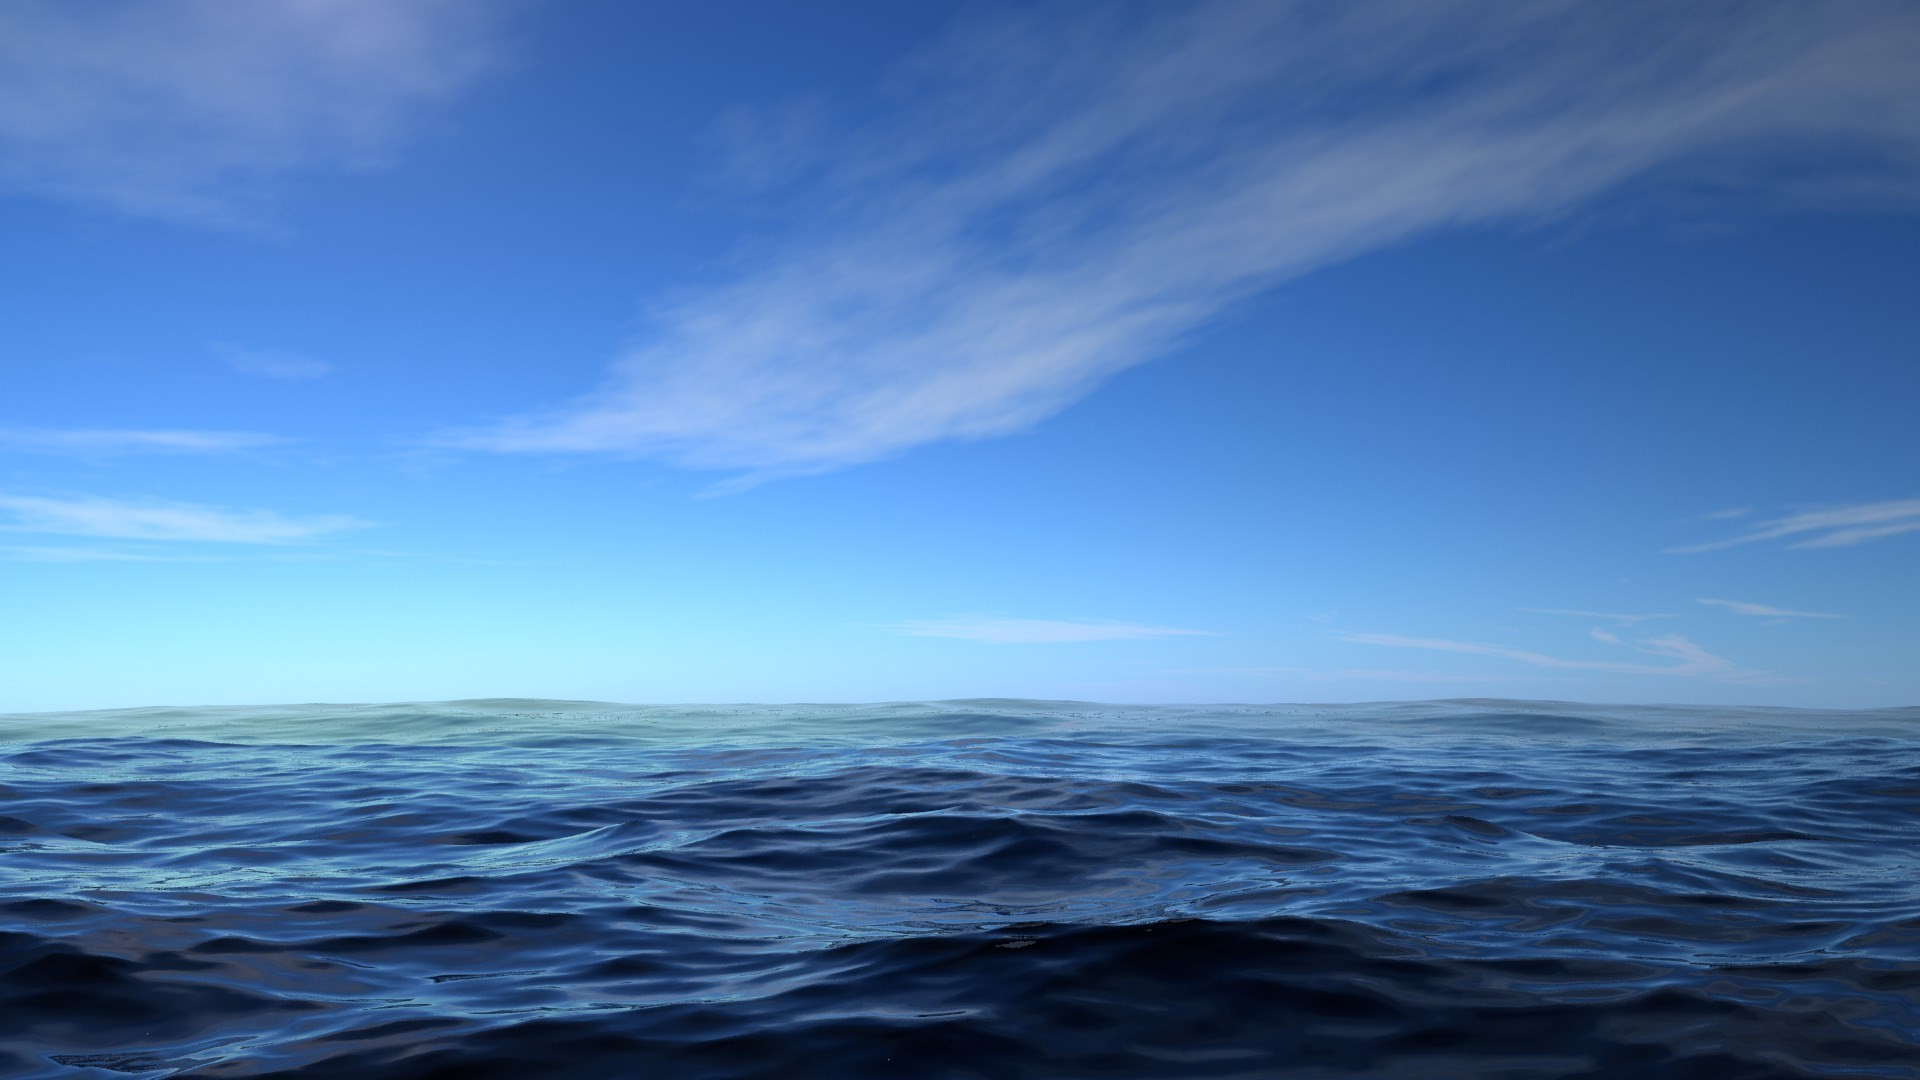 Halley Bush – Amazing ocean wallpaper – 1920 x 1080 px   ololoshenka    Pinterest   Ocean, Mac desktop and Screensaver